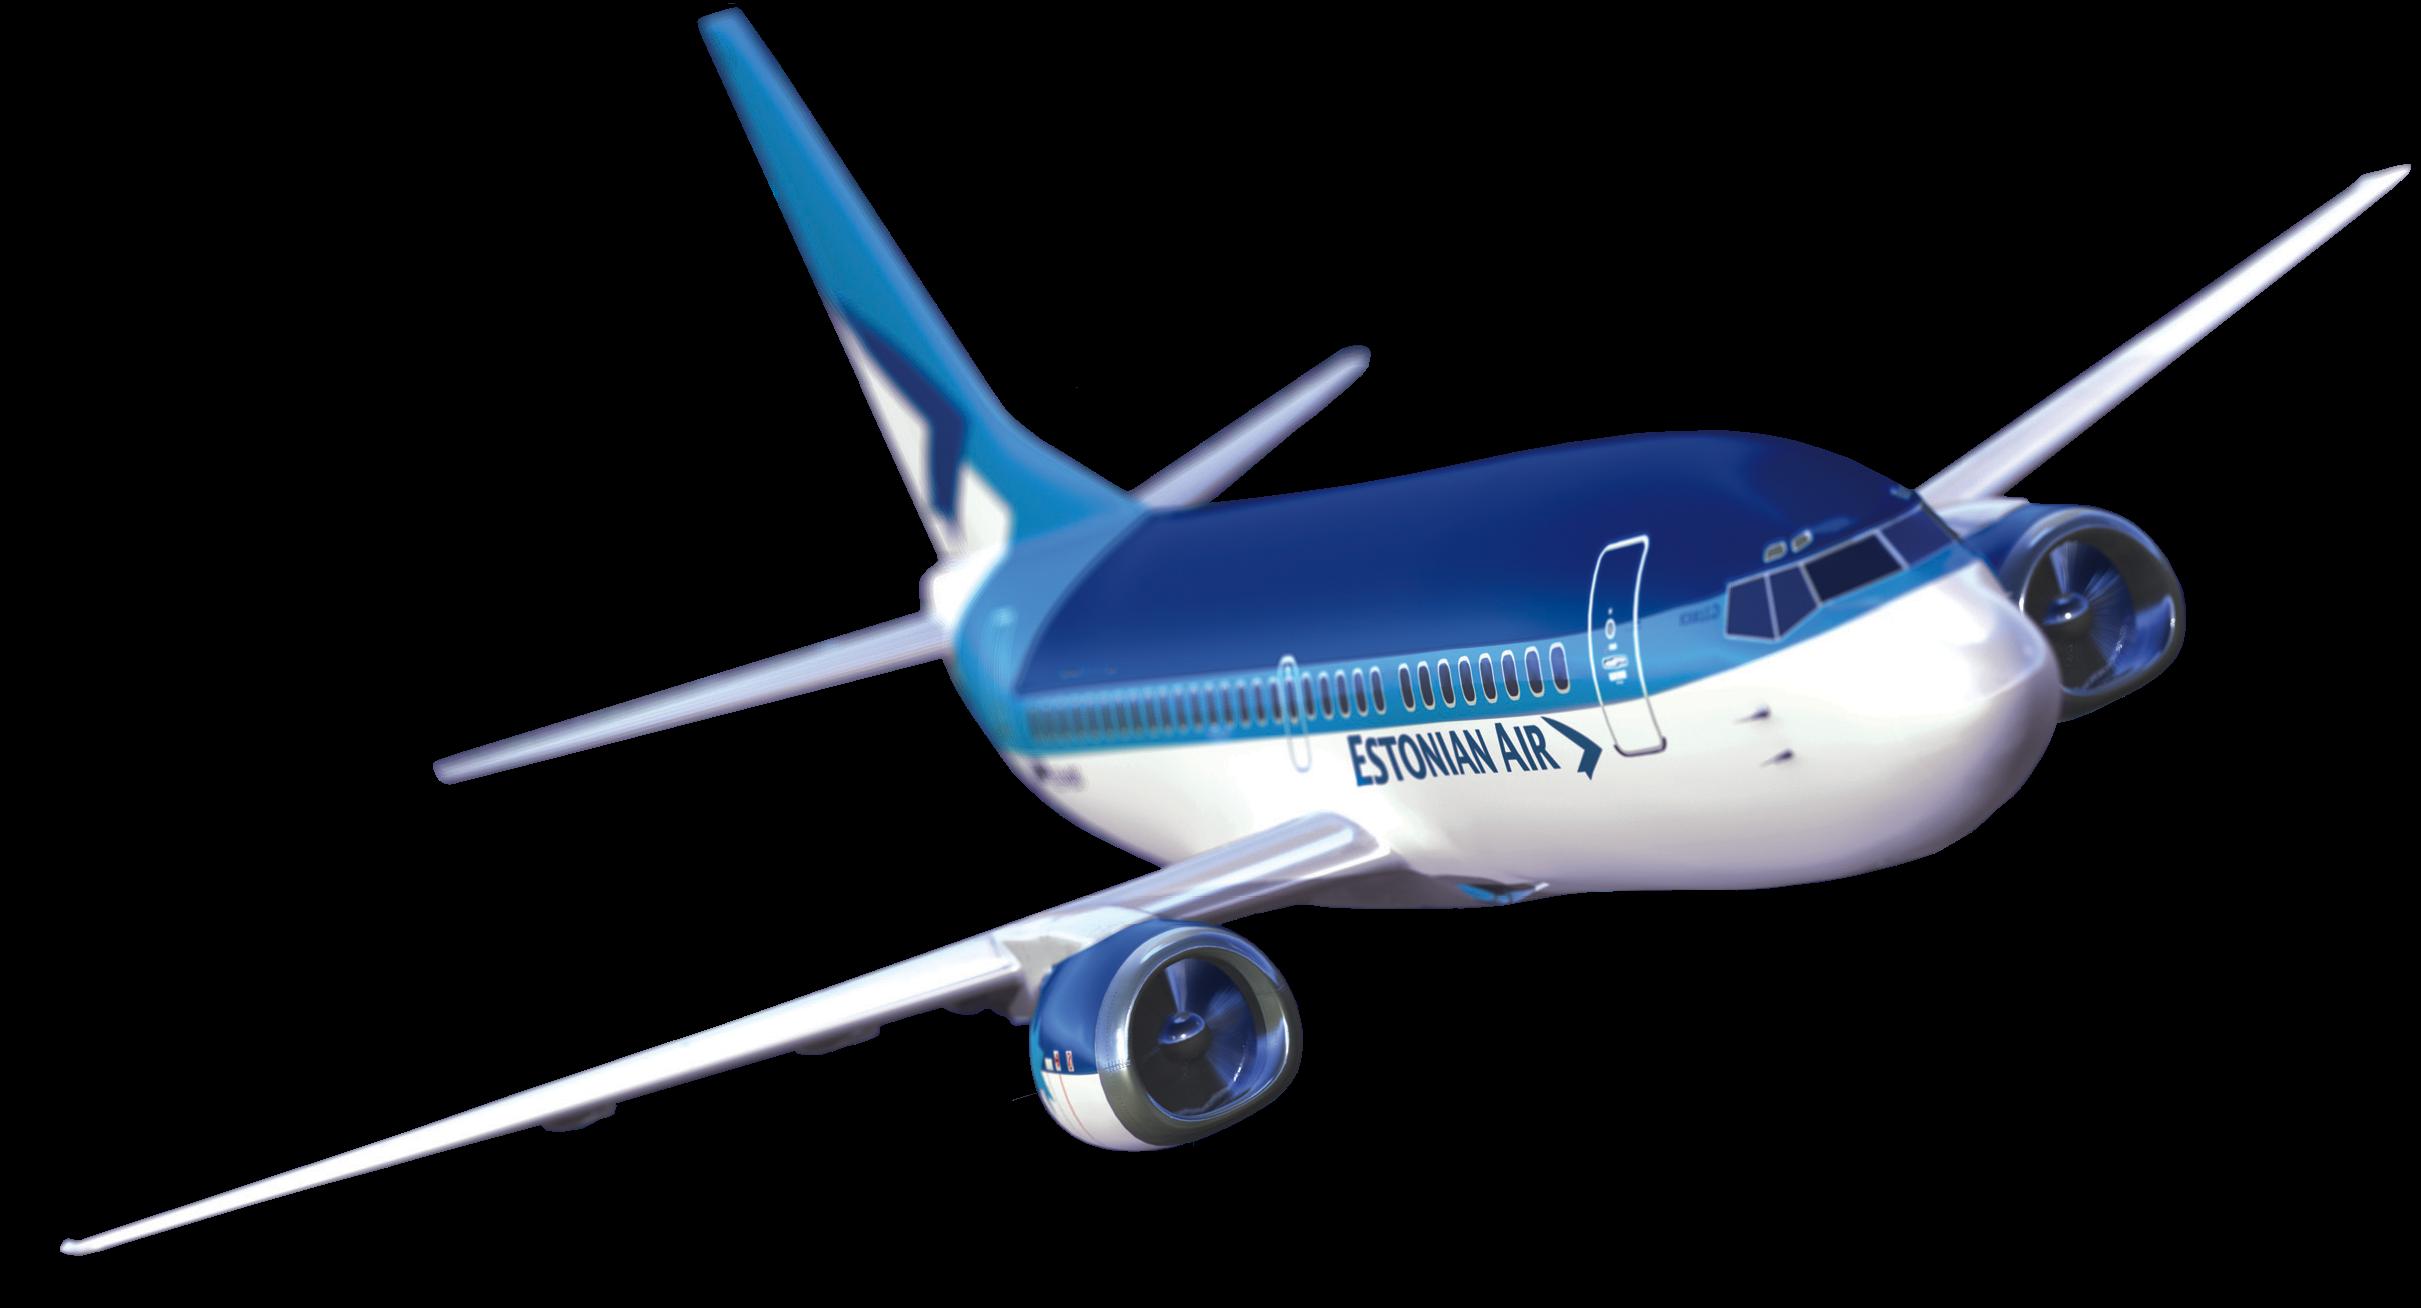 Aircraft clipart boeing Plane Clip Free Art Art